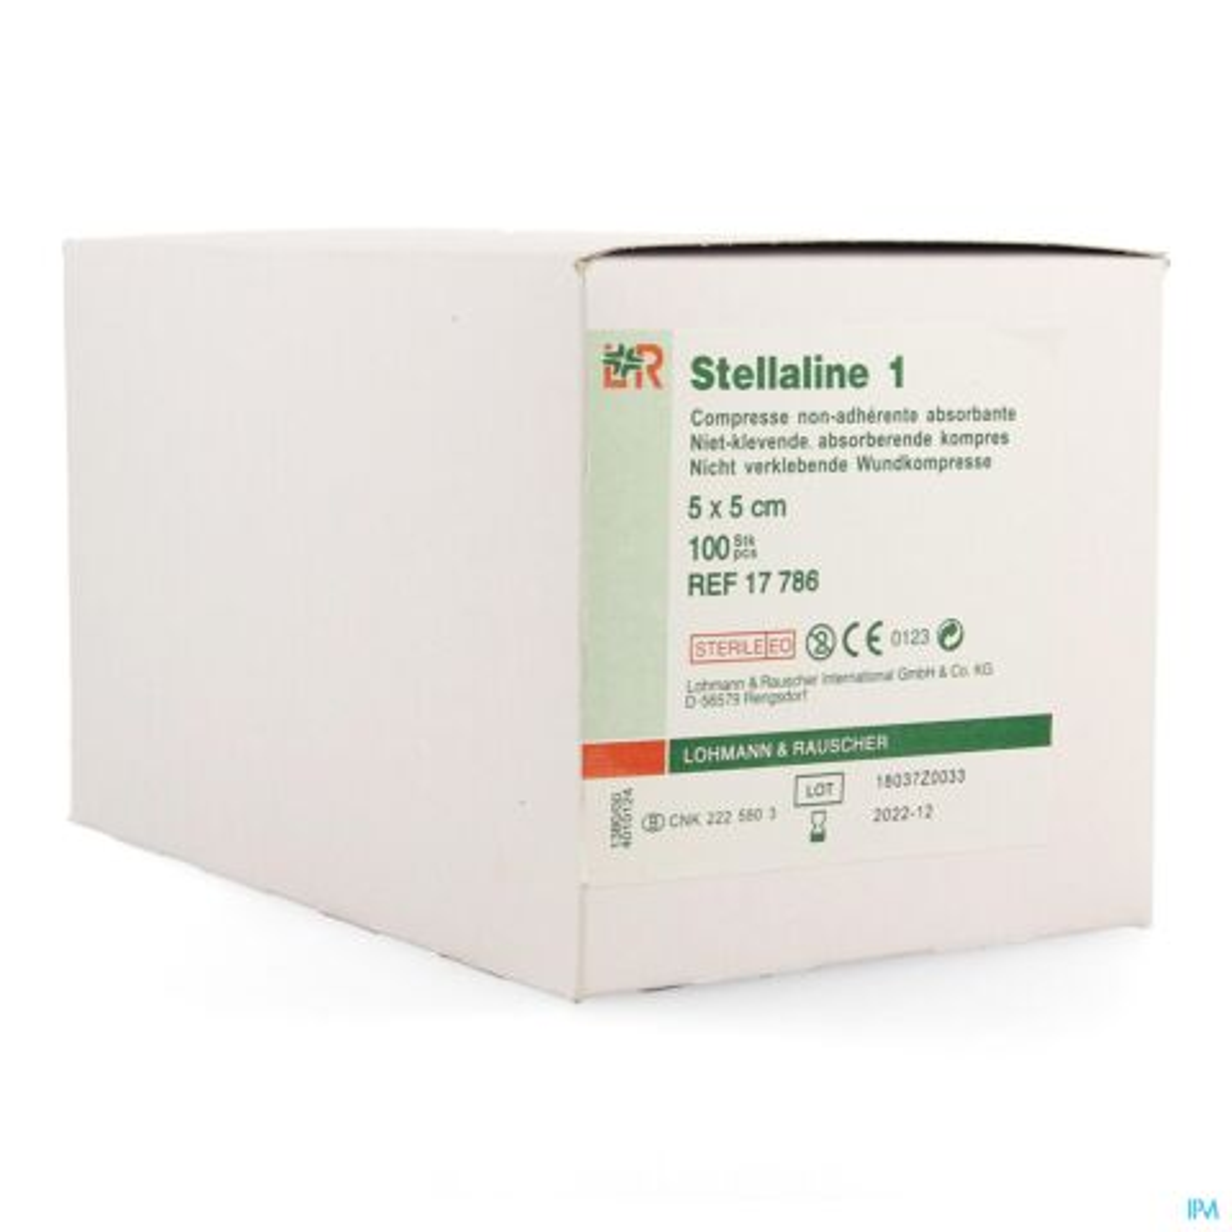 Stellaline 1 Comp Ster 5,0x 5,0cm 100 17786